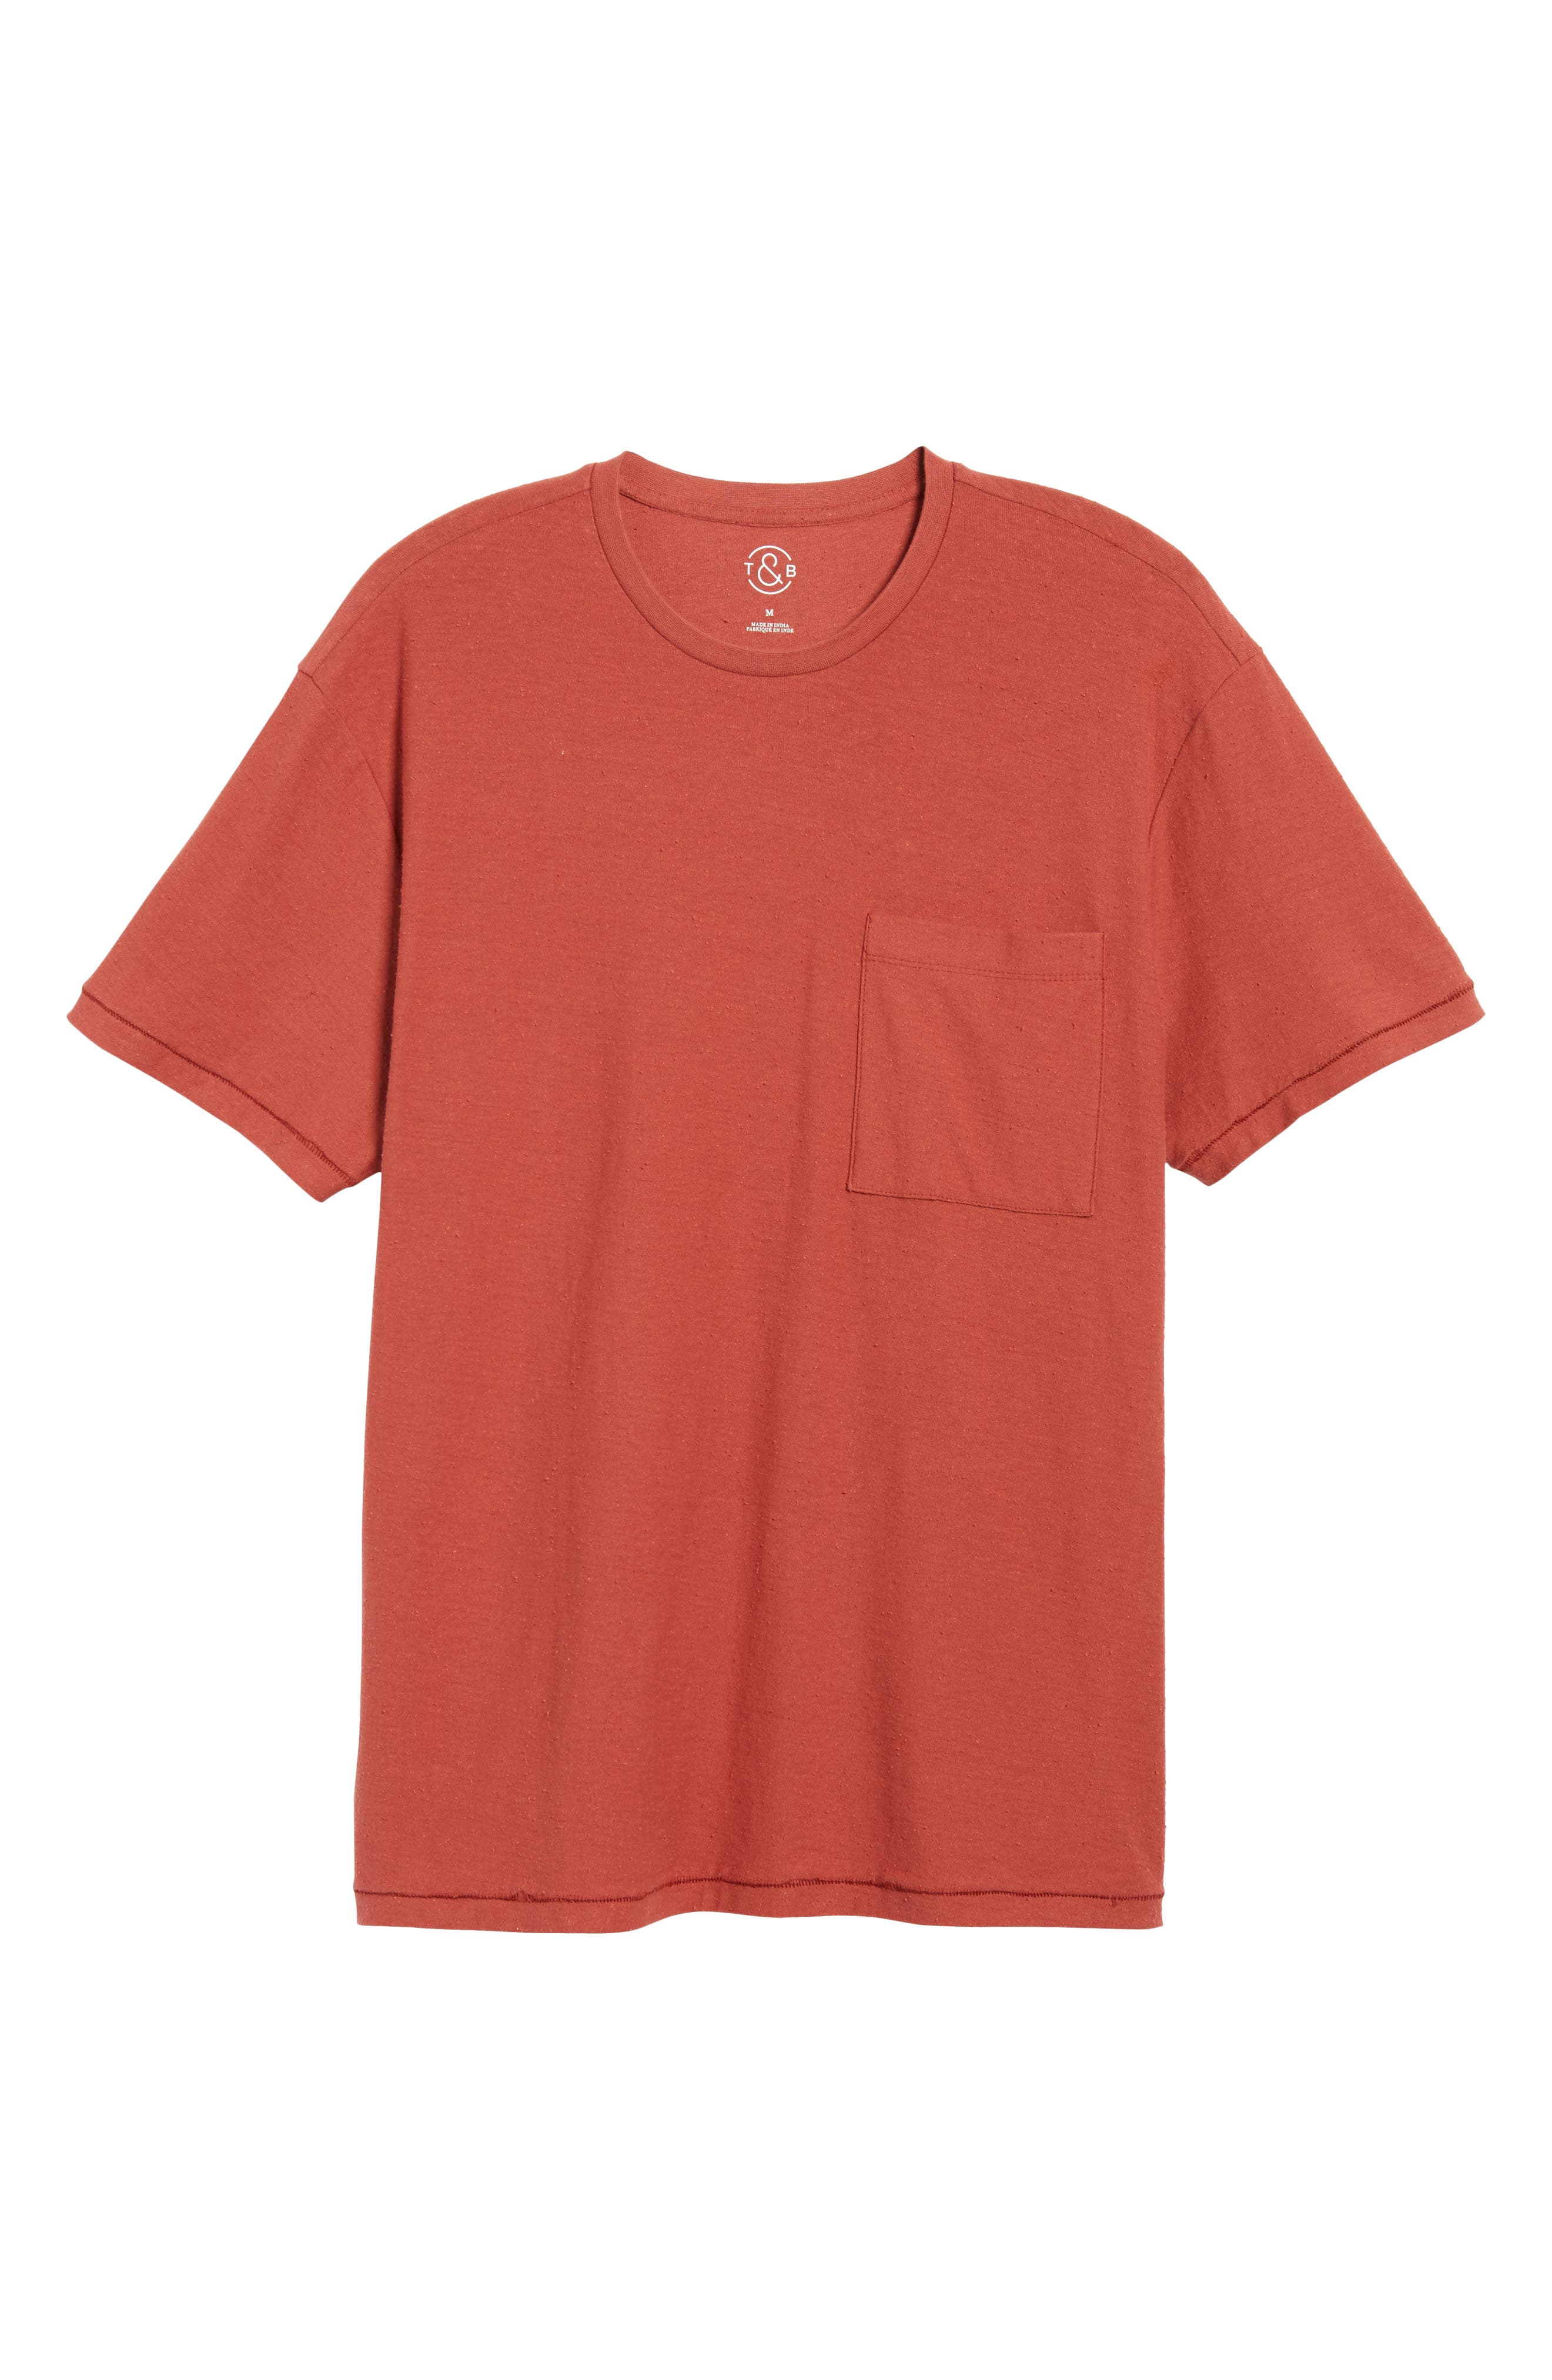 Nep Cotton Pocket T-Shirt,                             Alternate thumbnail 11, color,